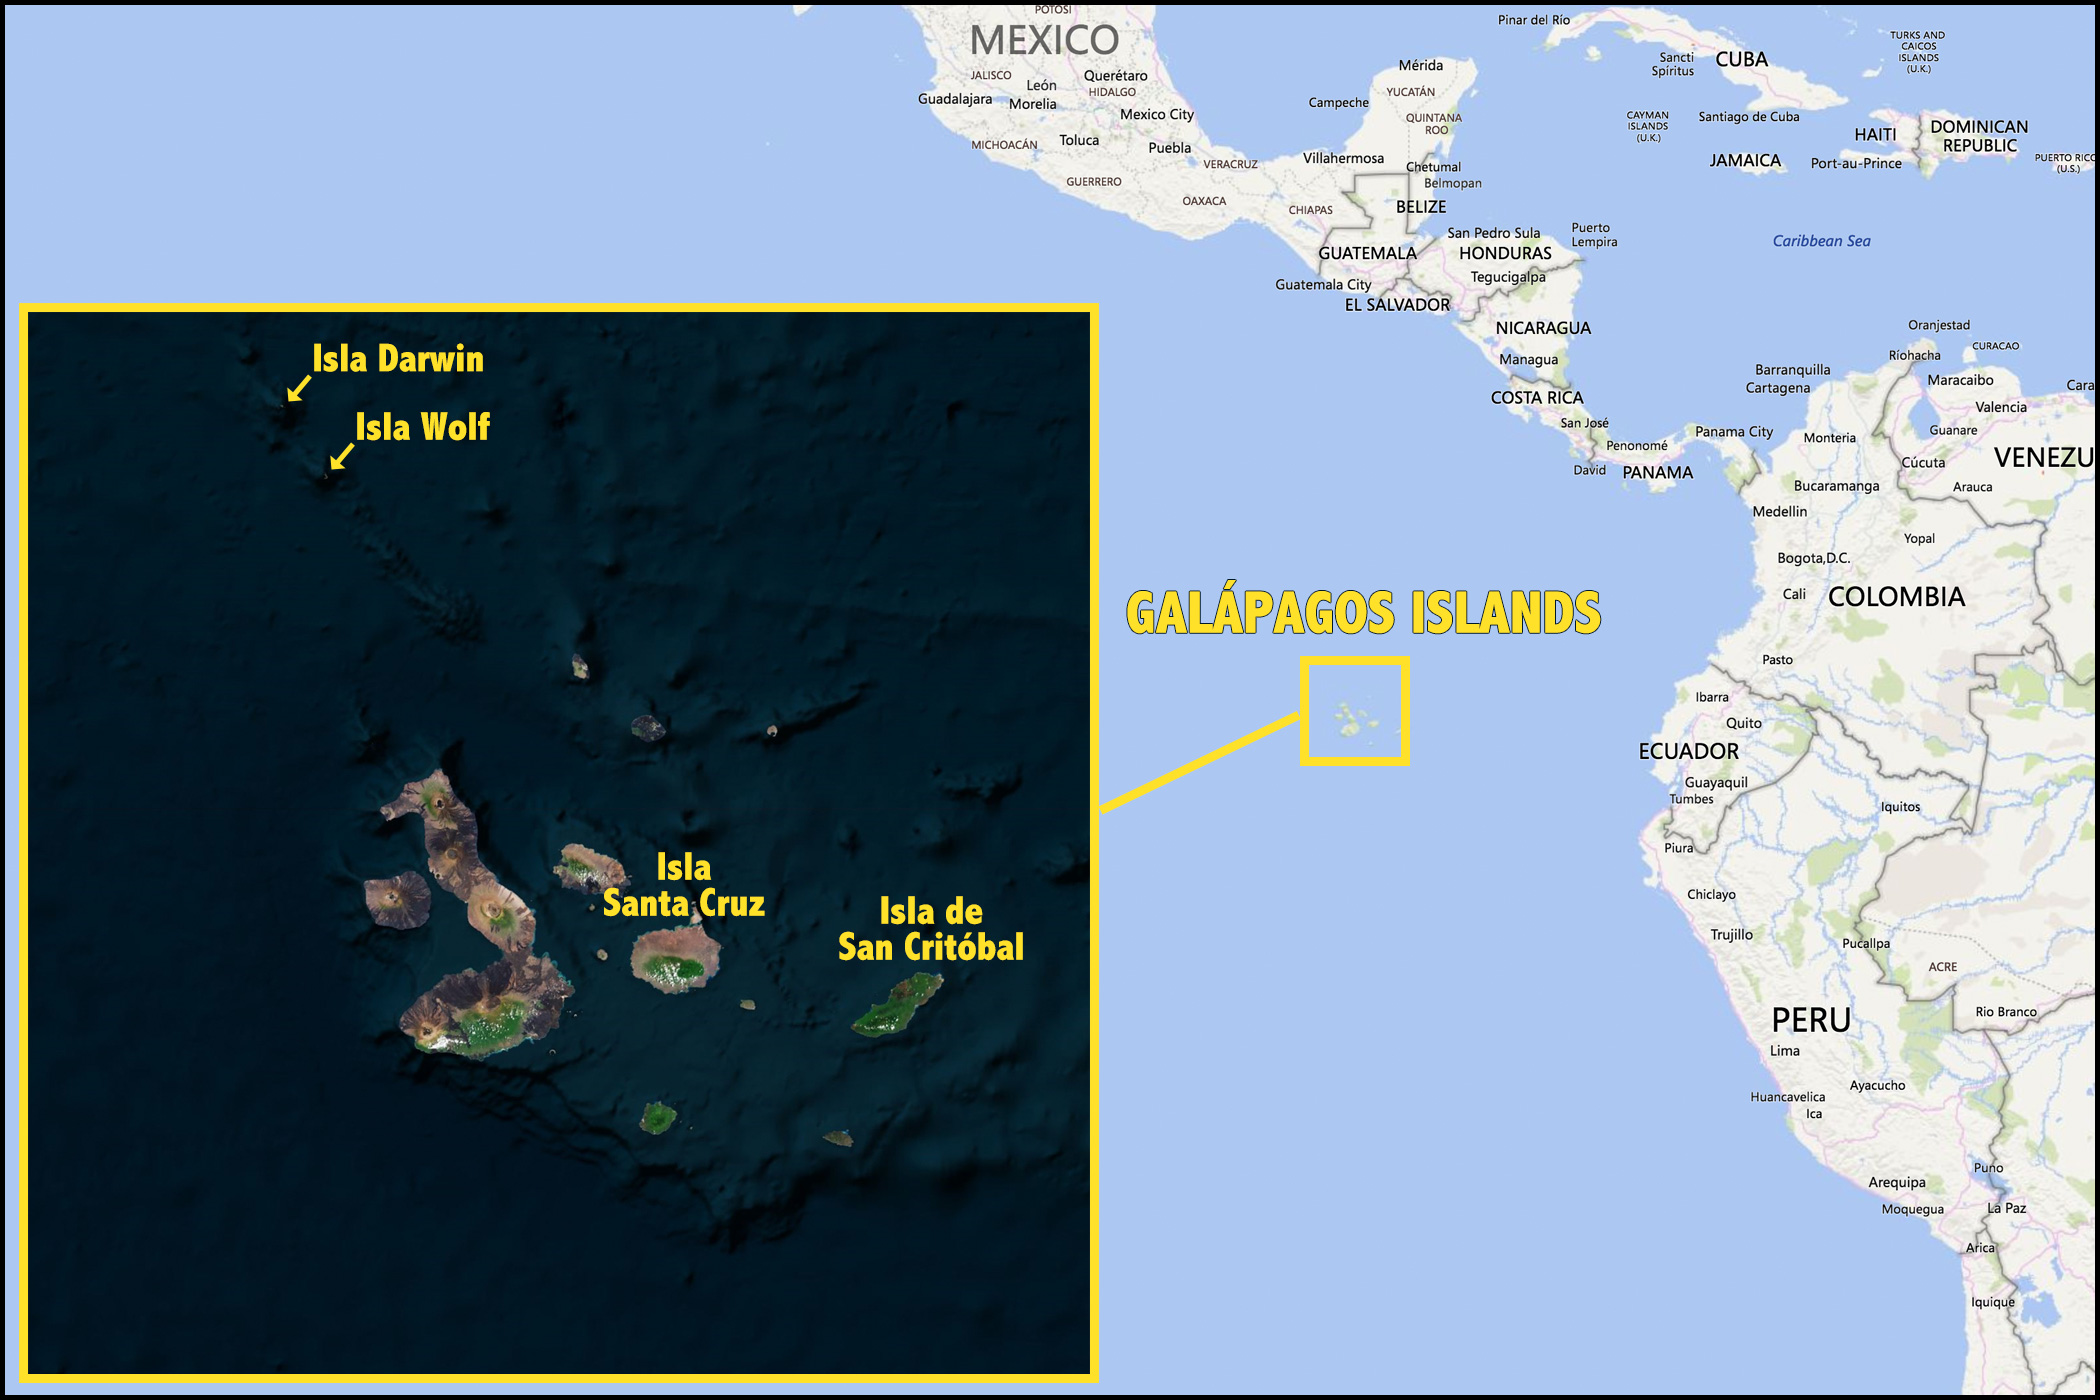 galapagos-map Galapagos Map on puerto ayora, pinta island, amazon map, puerto baquerizo moreno, yucatan peninsula map, brazilian highlands map, cuba map, oman map, isabela island, bahamas map, lesser antilles map, ha long bay, genovesa island, puerto rico map, charles darwin research station, nameless island, greenland map, galapagos national park, cape horn map, strait of magellan map, patagonia map, japan map, darwin island, ecuador map, bay of fundy, pampas map, canada map, tierra del fuego map, pacific map, fernandina island, baltra island, lake titicaca map, floreana island, falklands map,